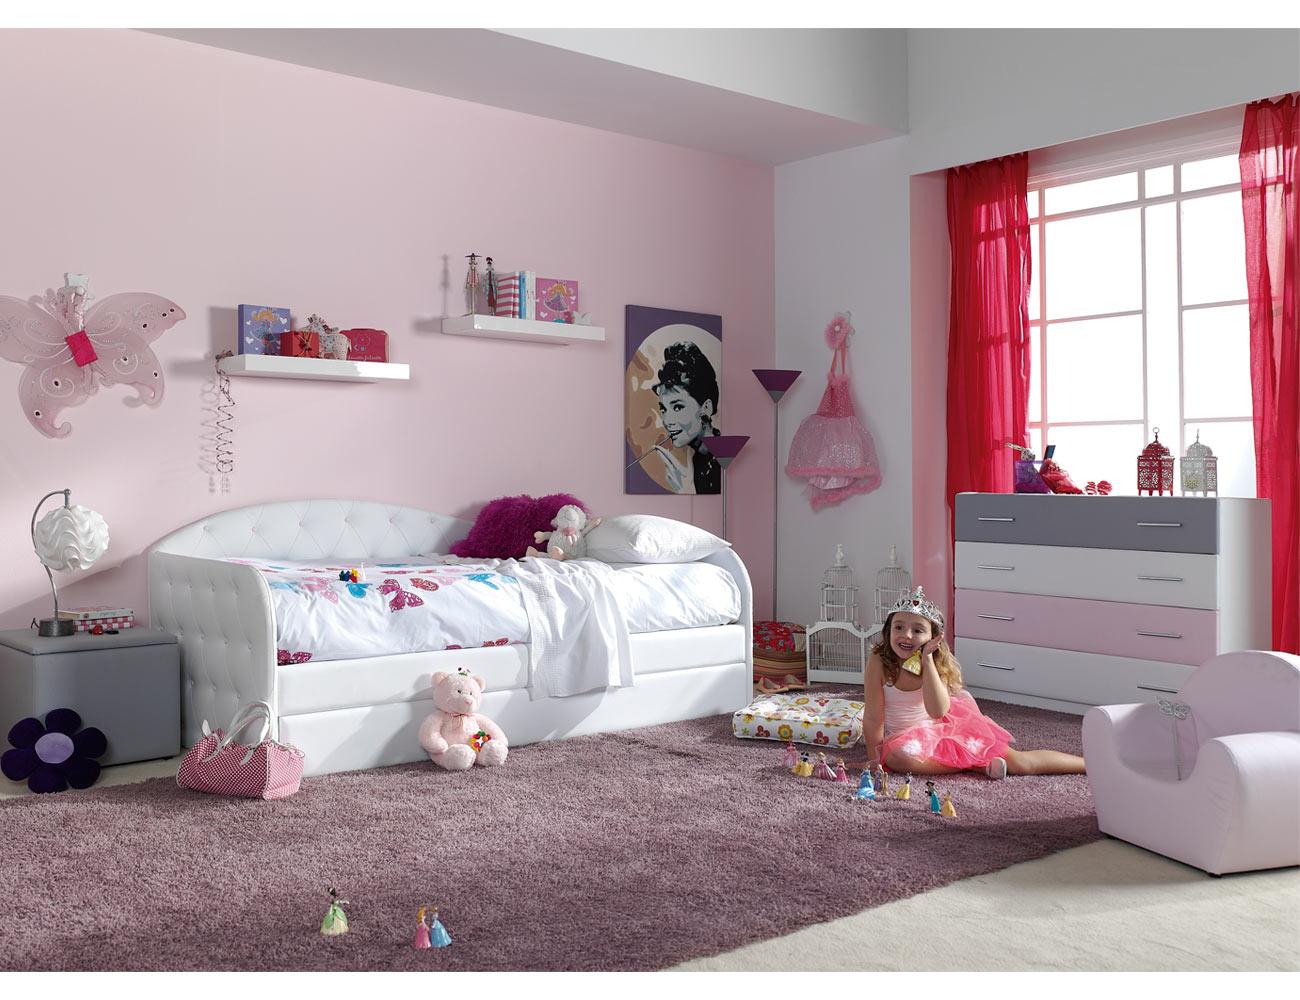 243 cama nido16